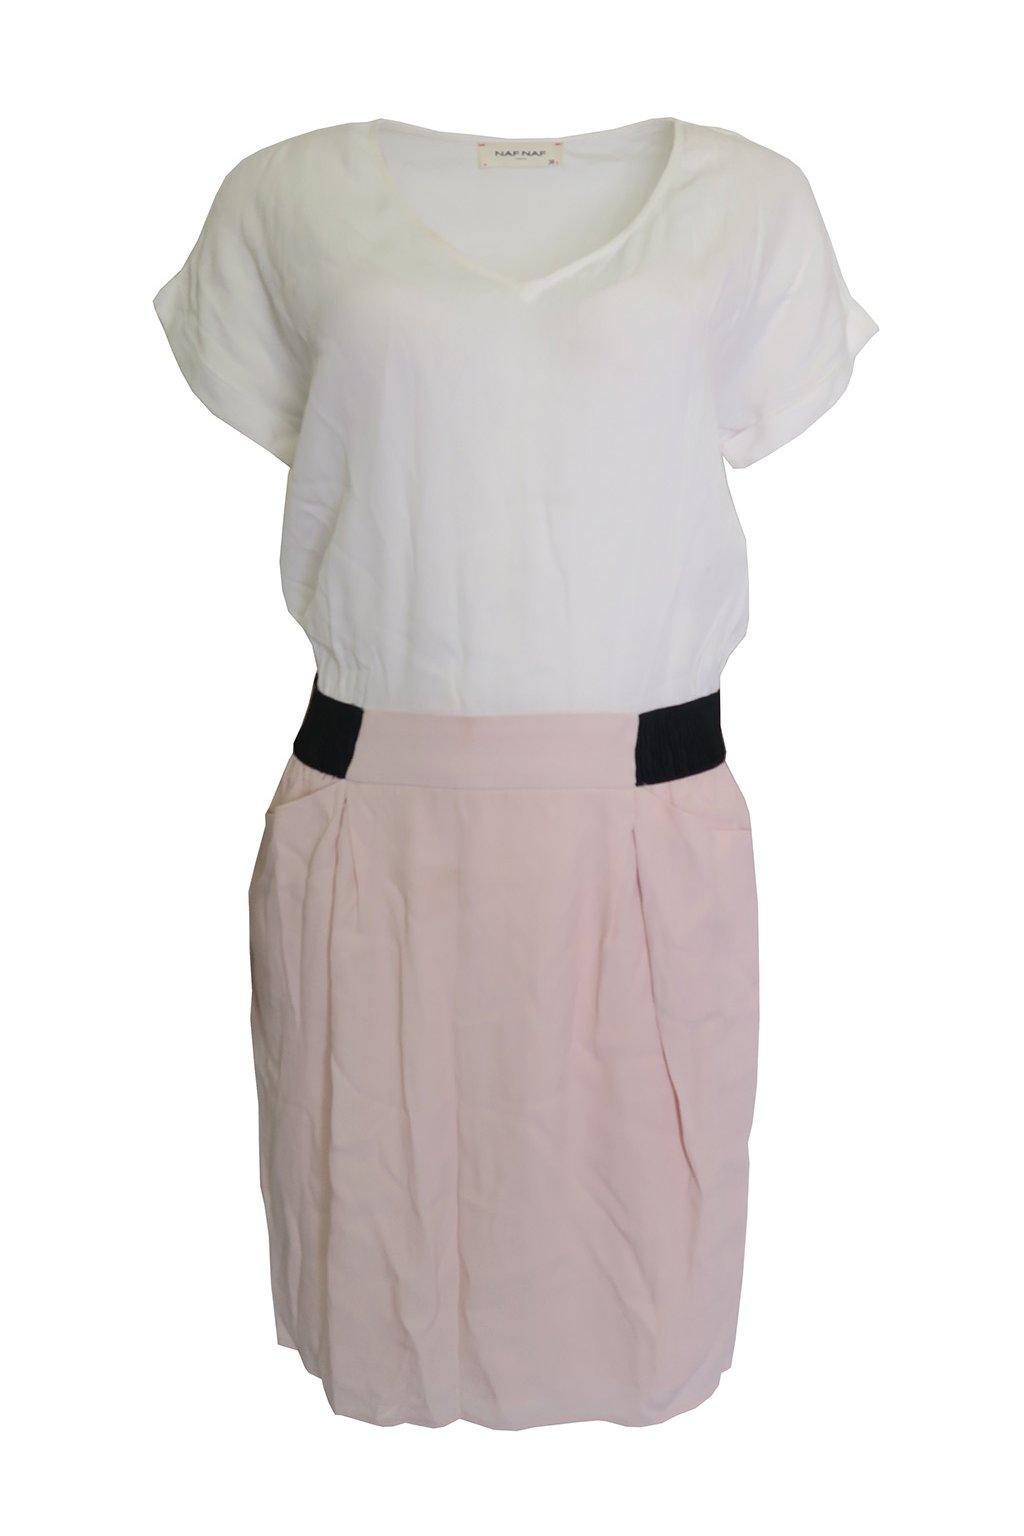 Bílorůžové šaty Naf Naf